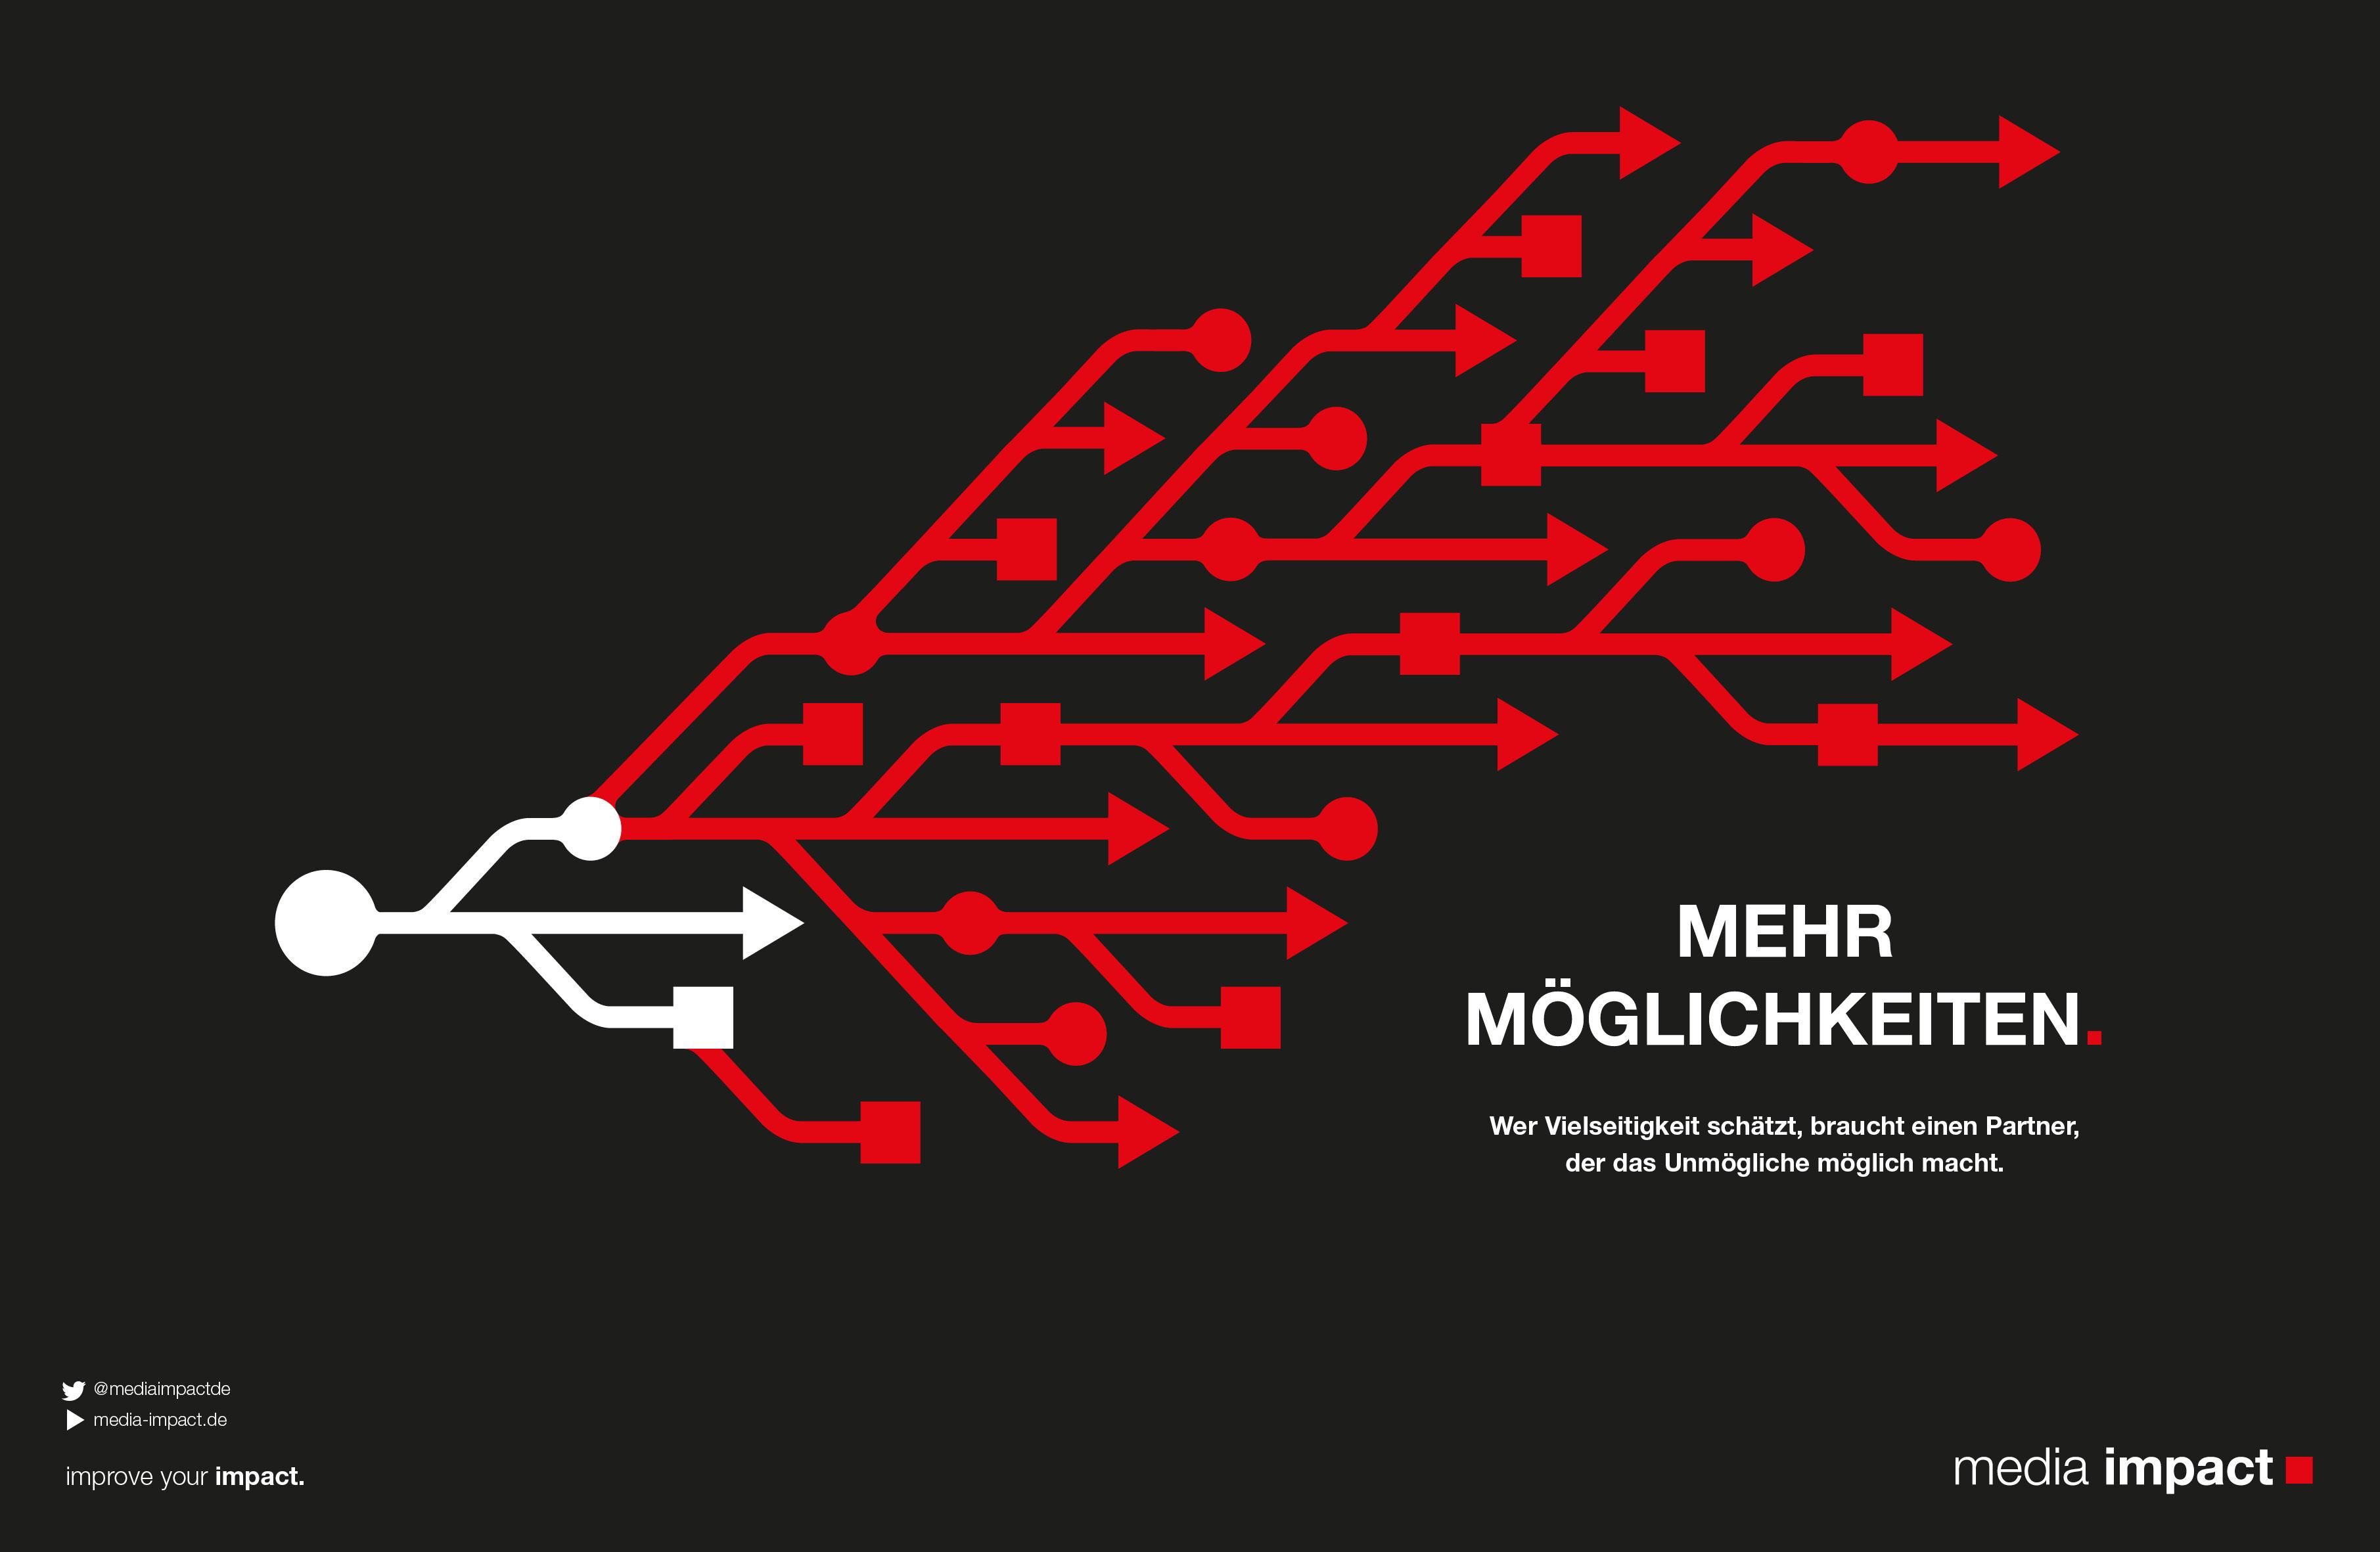 Media Impact Mehr Moeglichkeiten Motiv USB